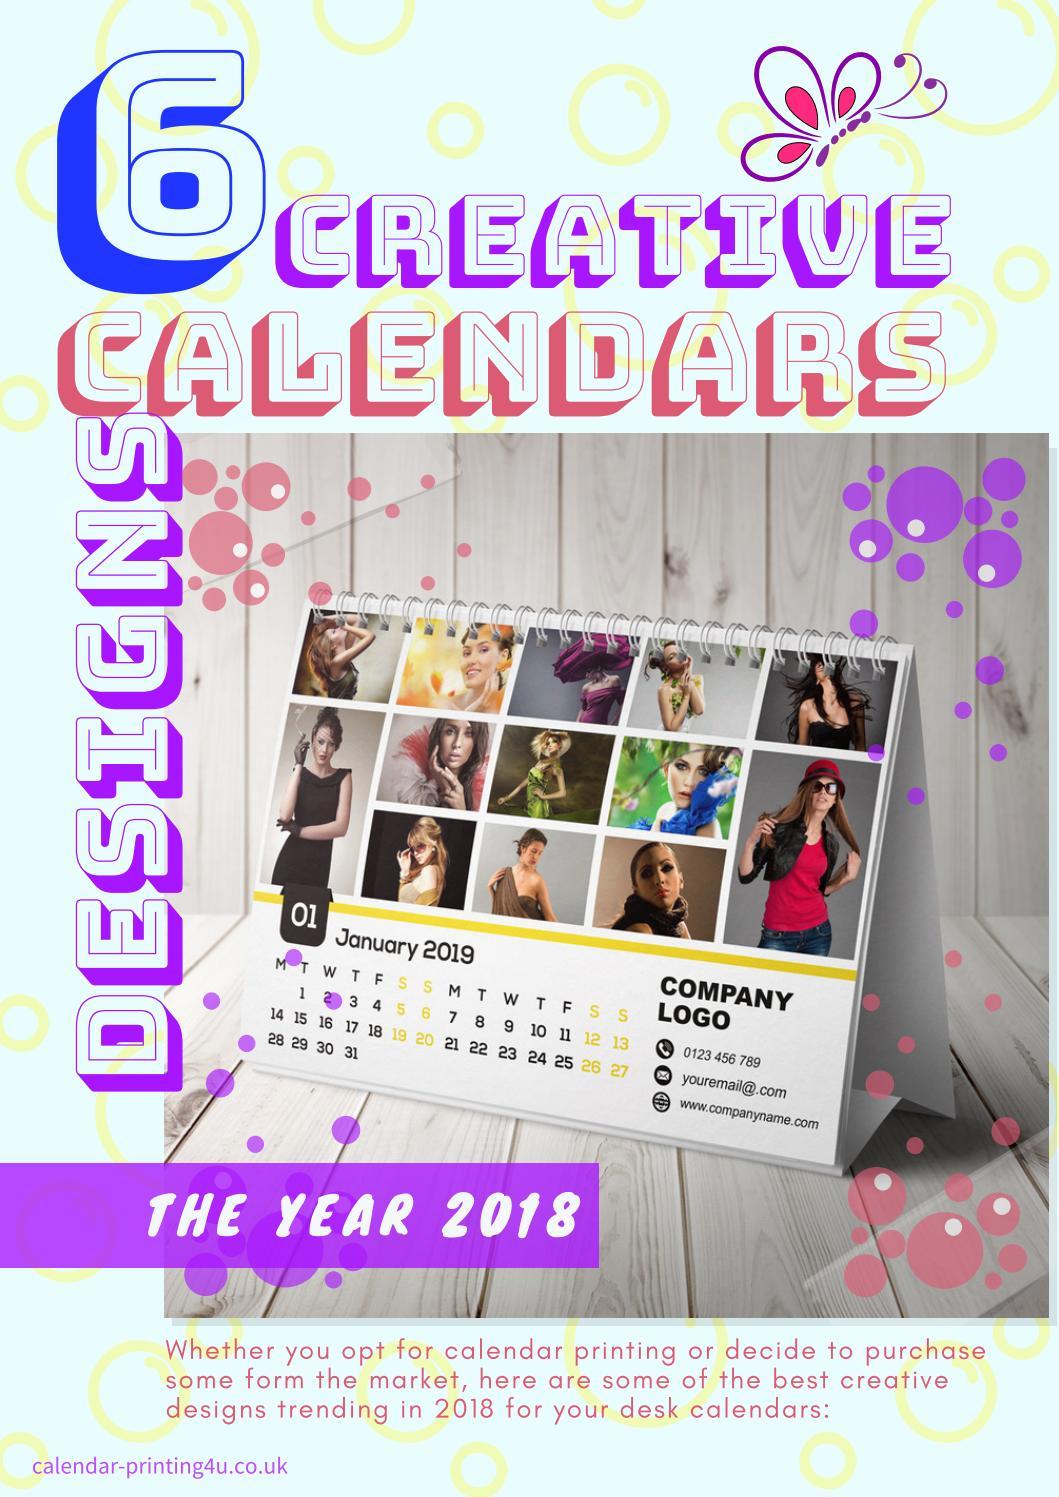 6 Creative Calendar Design Ideas For Your Desk For The Year